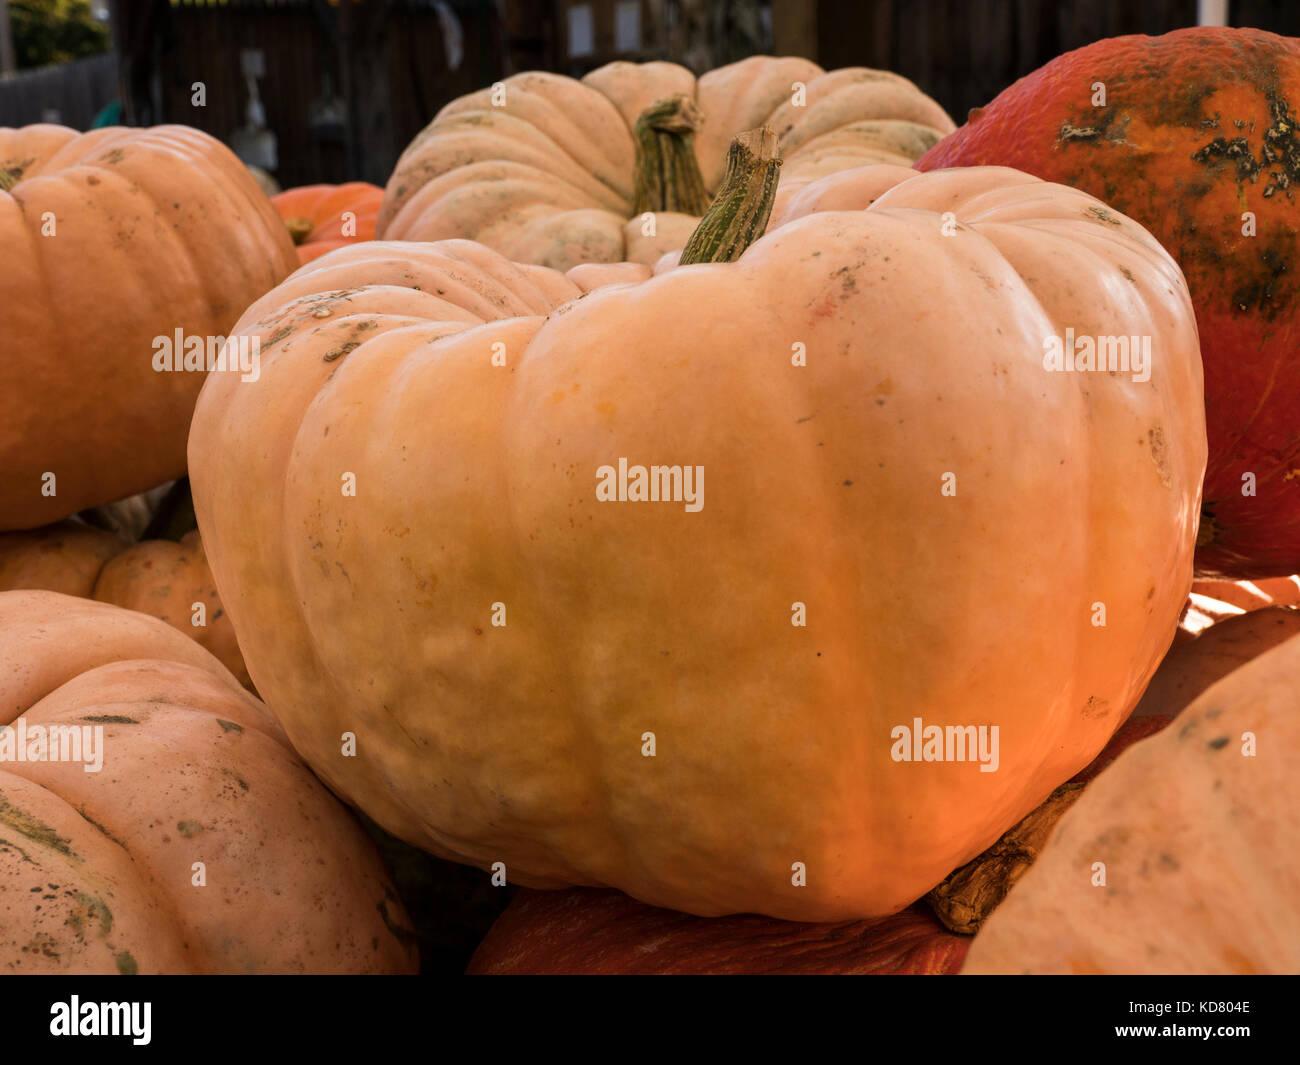 Mini-pumpkins, Woodstock Farmers' Market, West Woodstock, Vermont. - Stock Image